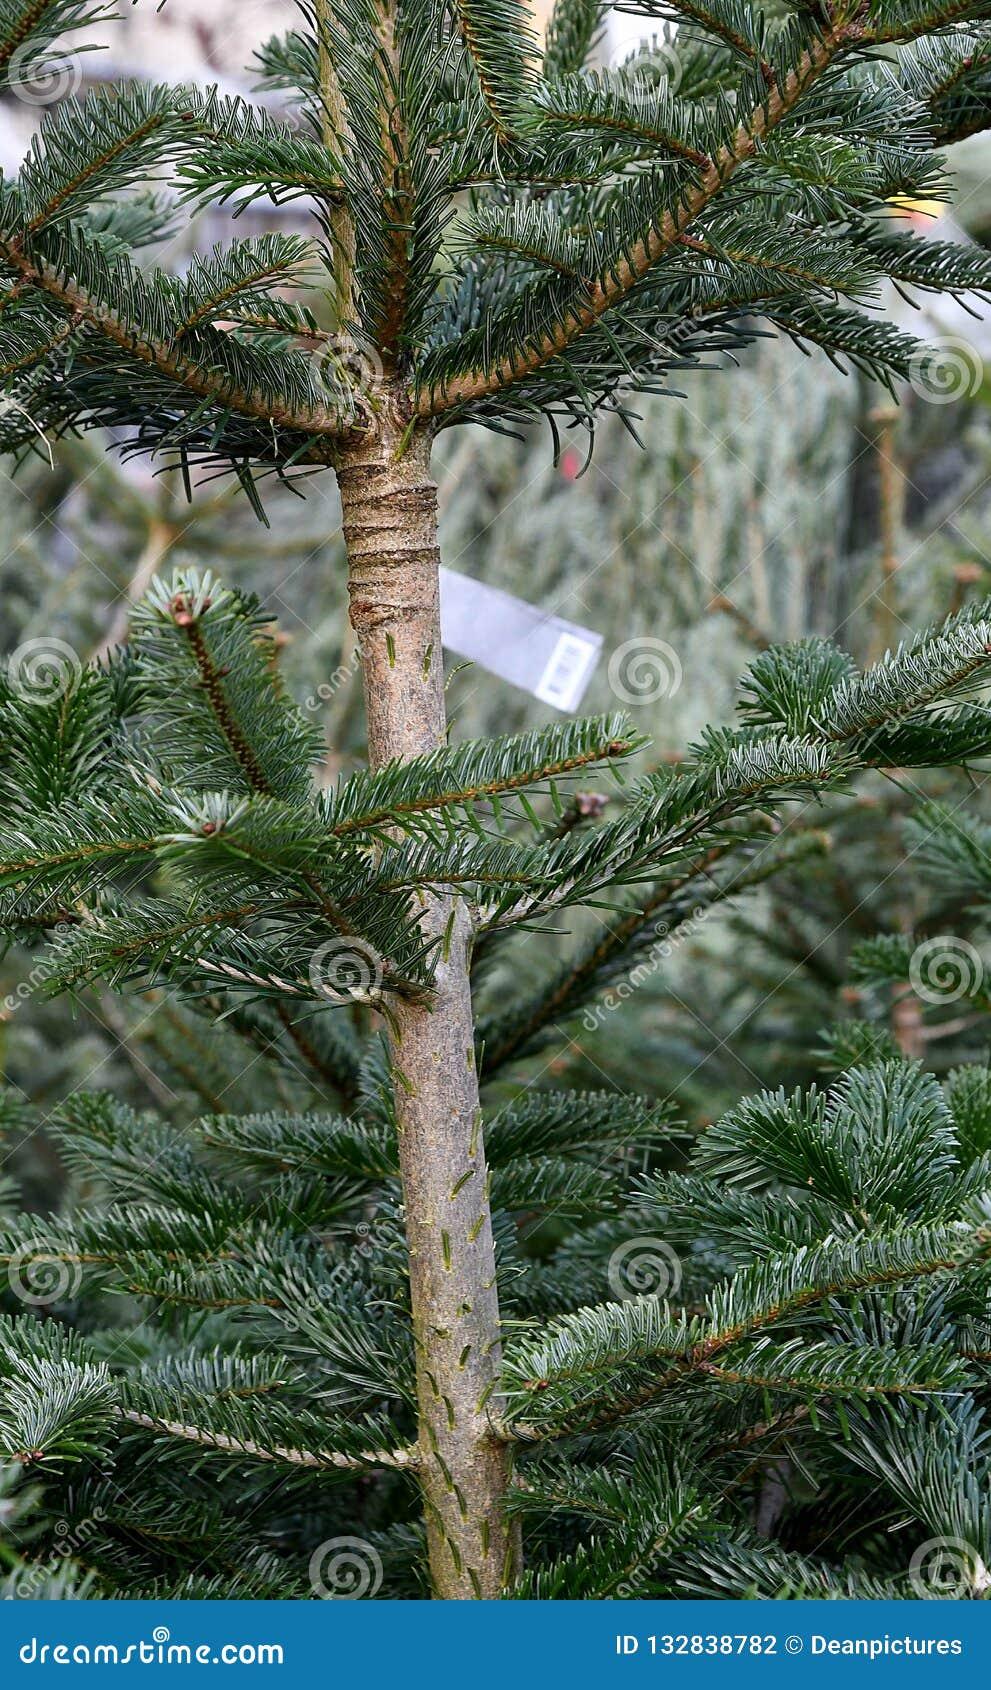 Christmas Trees For Sale.Green Christmas Trees For Sale In Copenhgen Denmark Stock